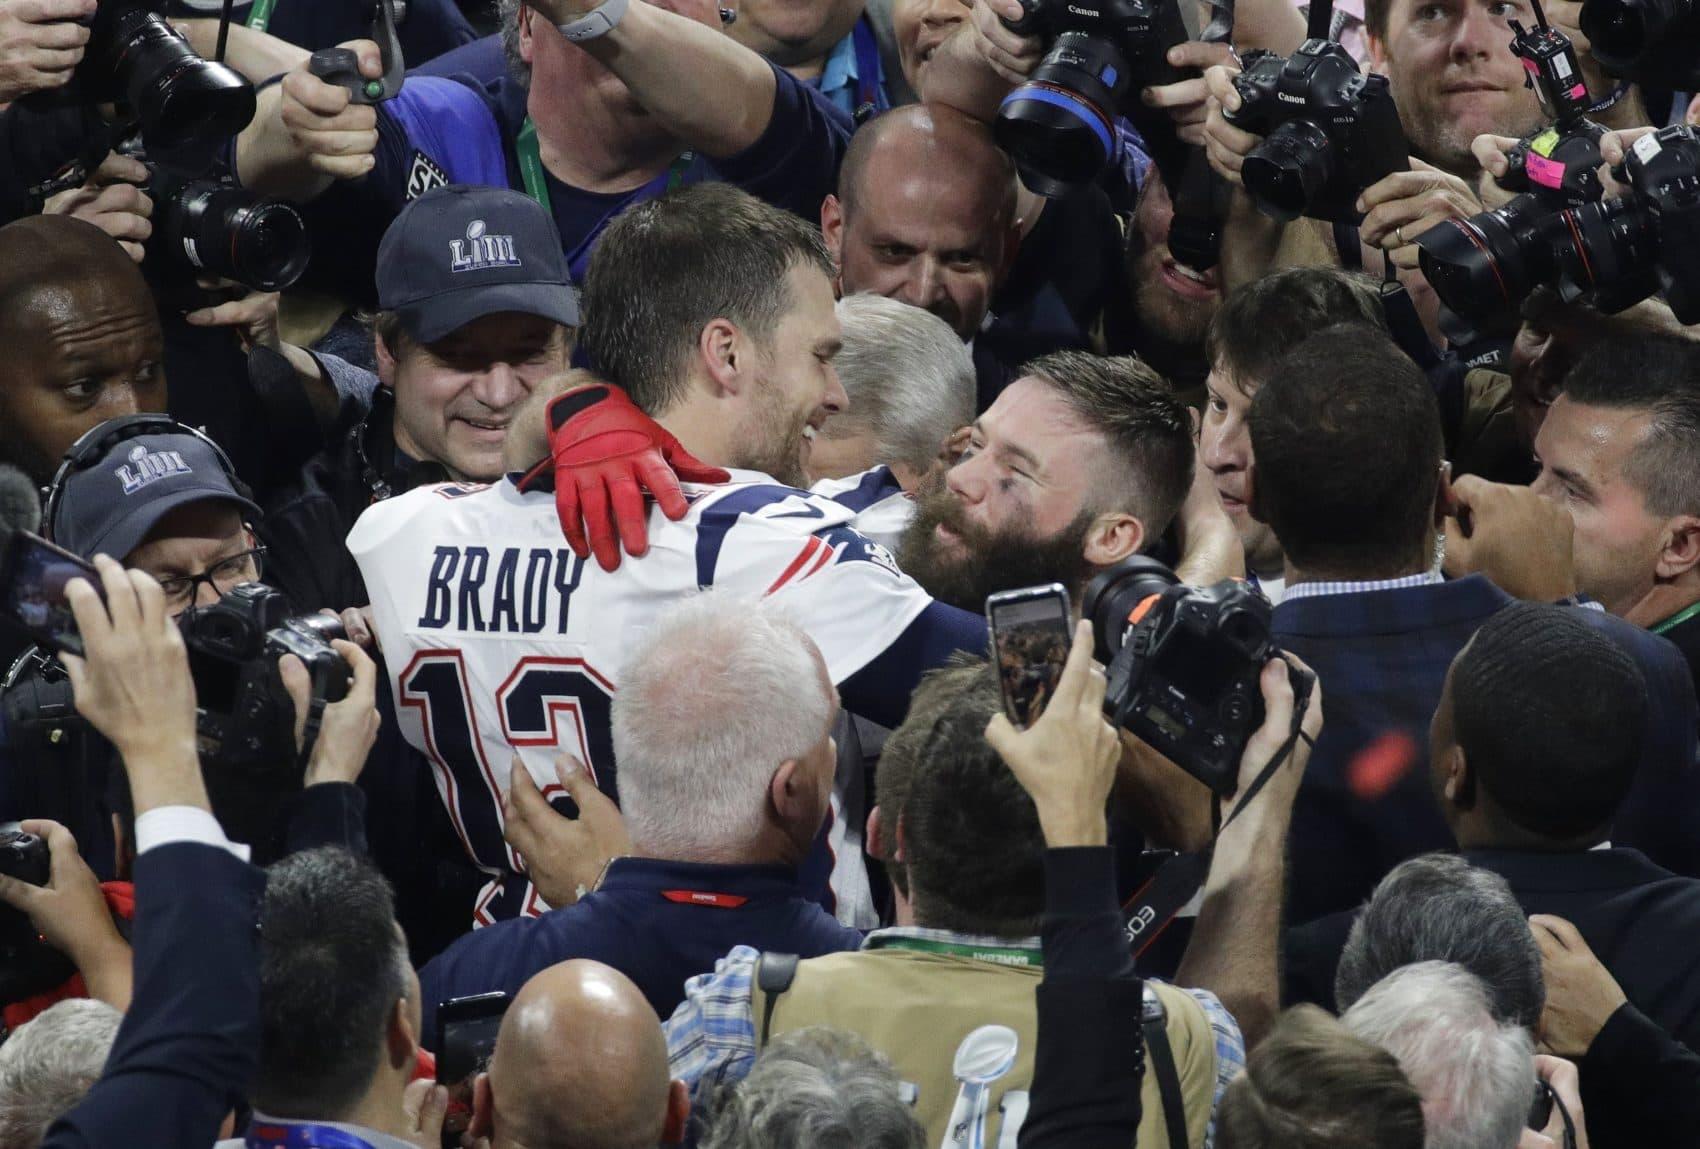 e40e32833 Patriots Beat Rams 13-3 In Lowest-Scoring Super Bowl Ever